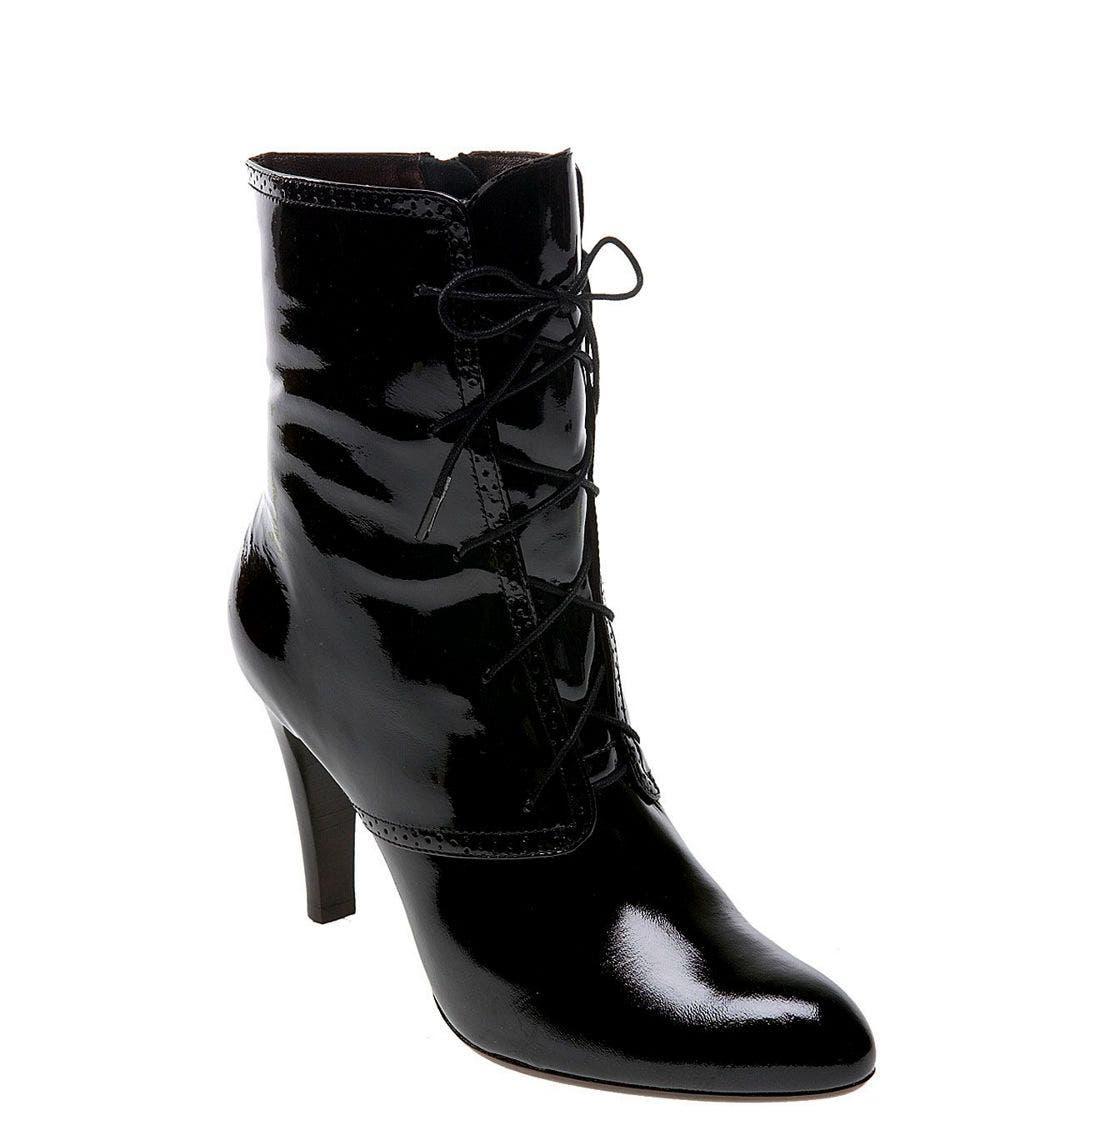 Alternate Image 1 Selected - Via Spiga 'Equis' Boot